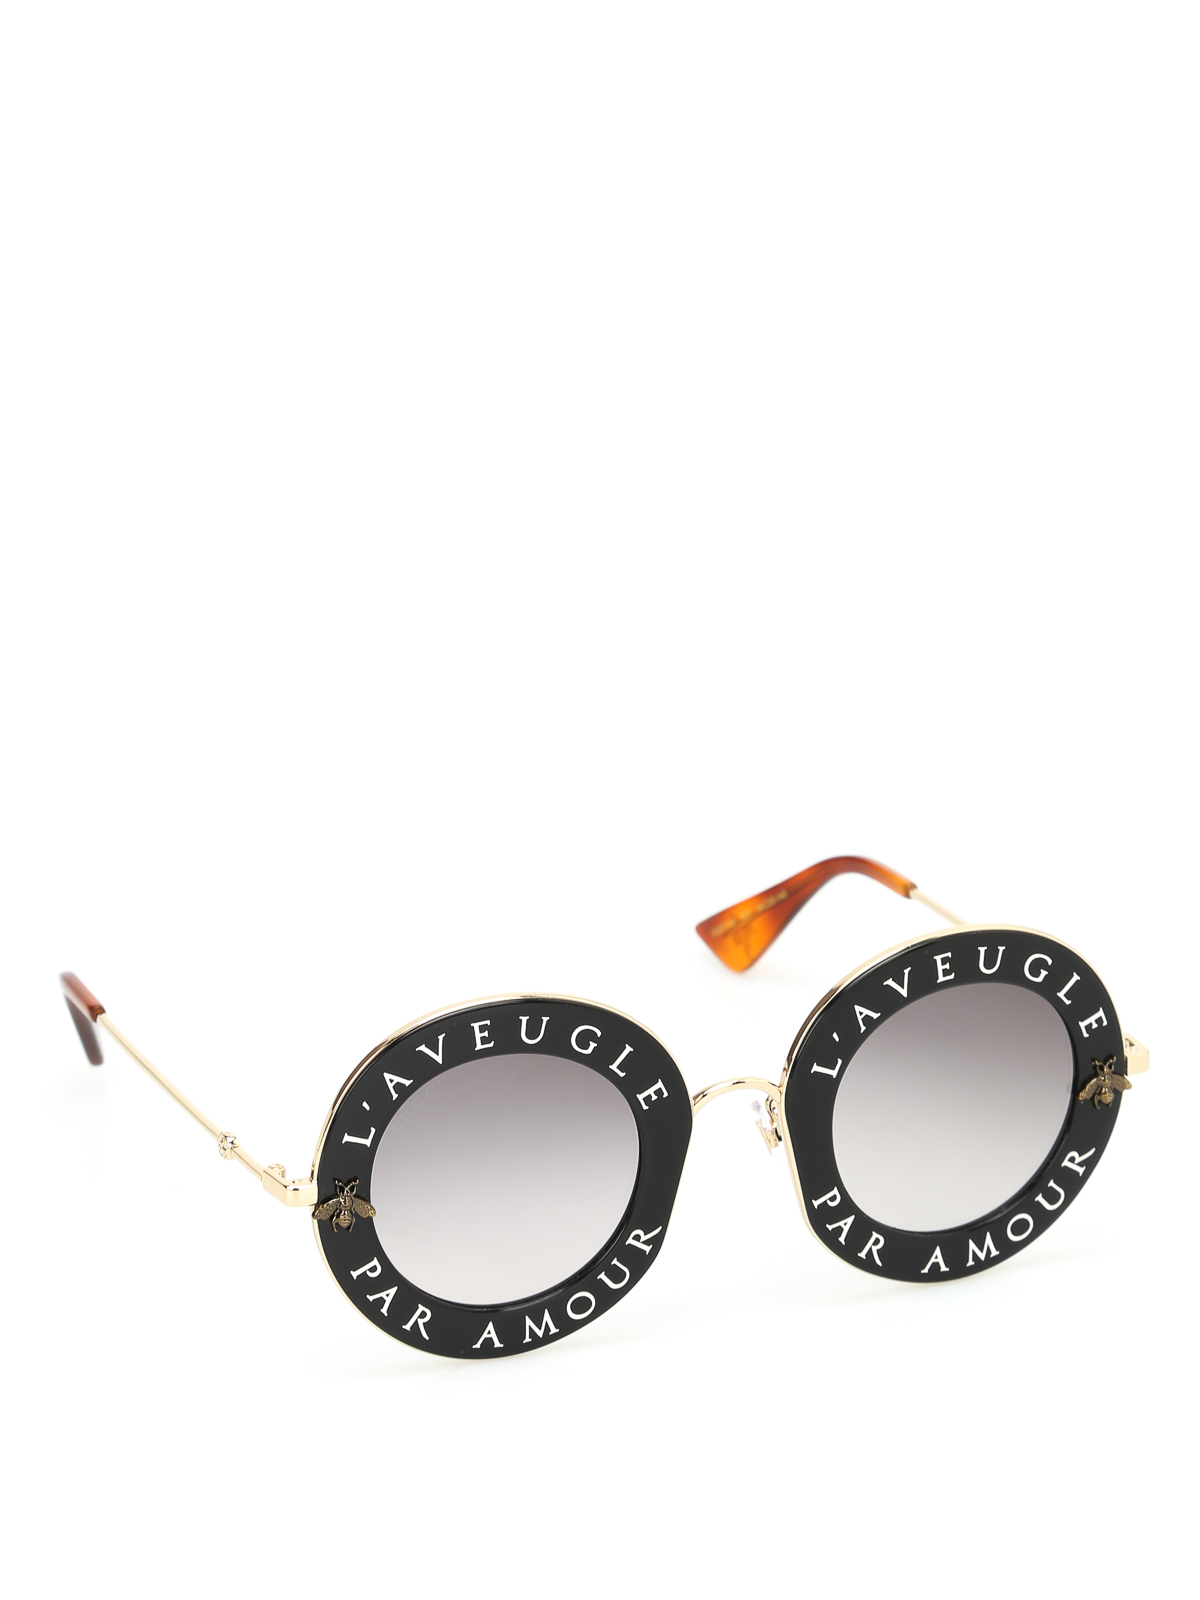 16ff3f2330b Gucci - L Aveugle Par Amour sunglasses - sunglasses - GG0113S1 ...